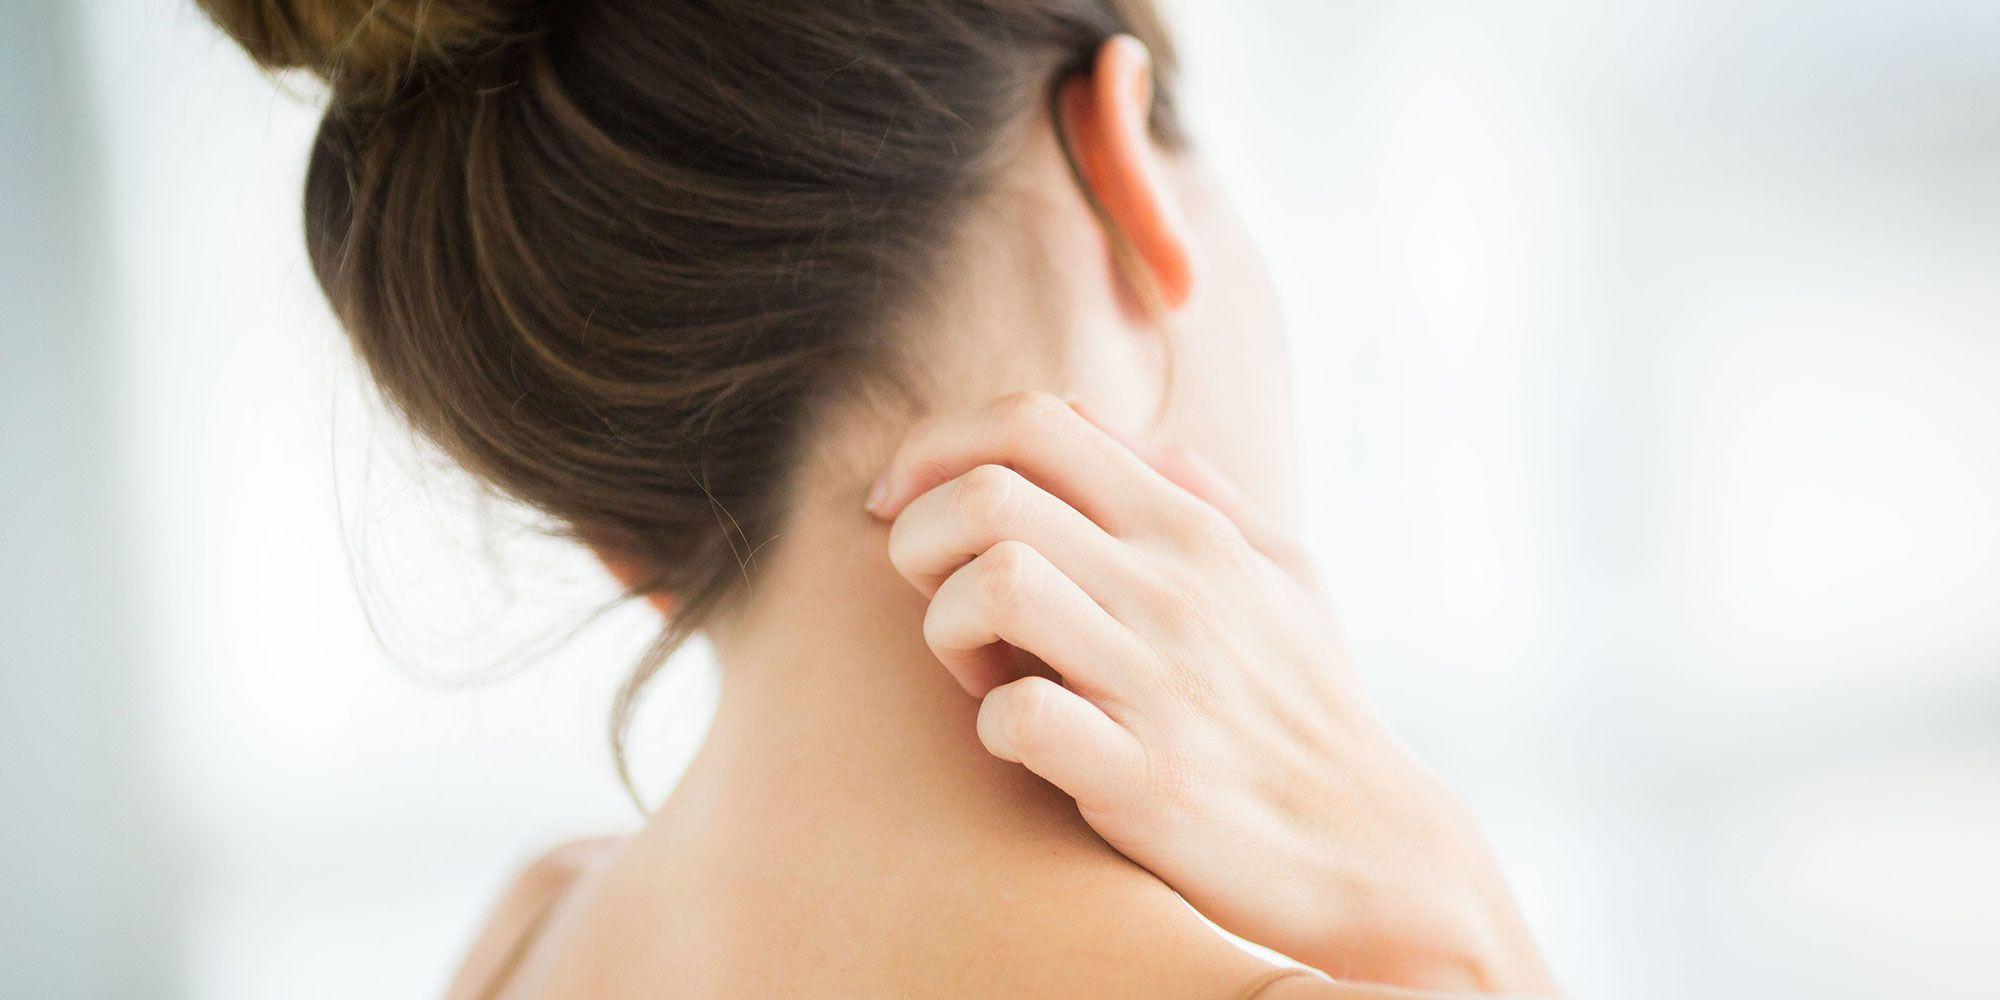 #SkinSchool: What is eczema?